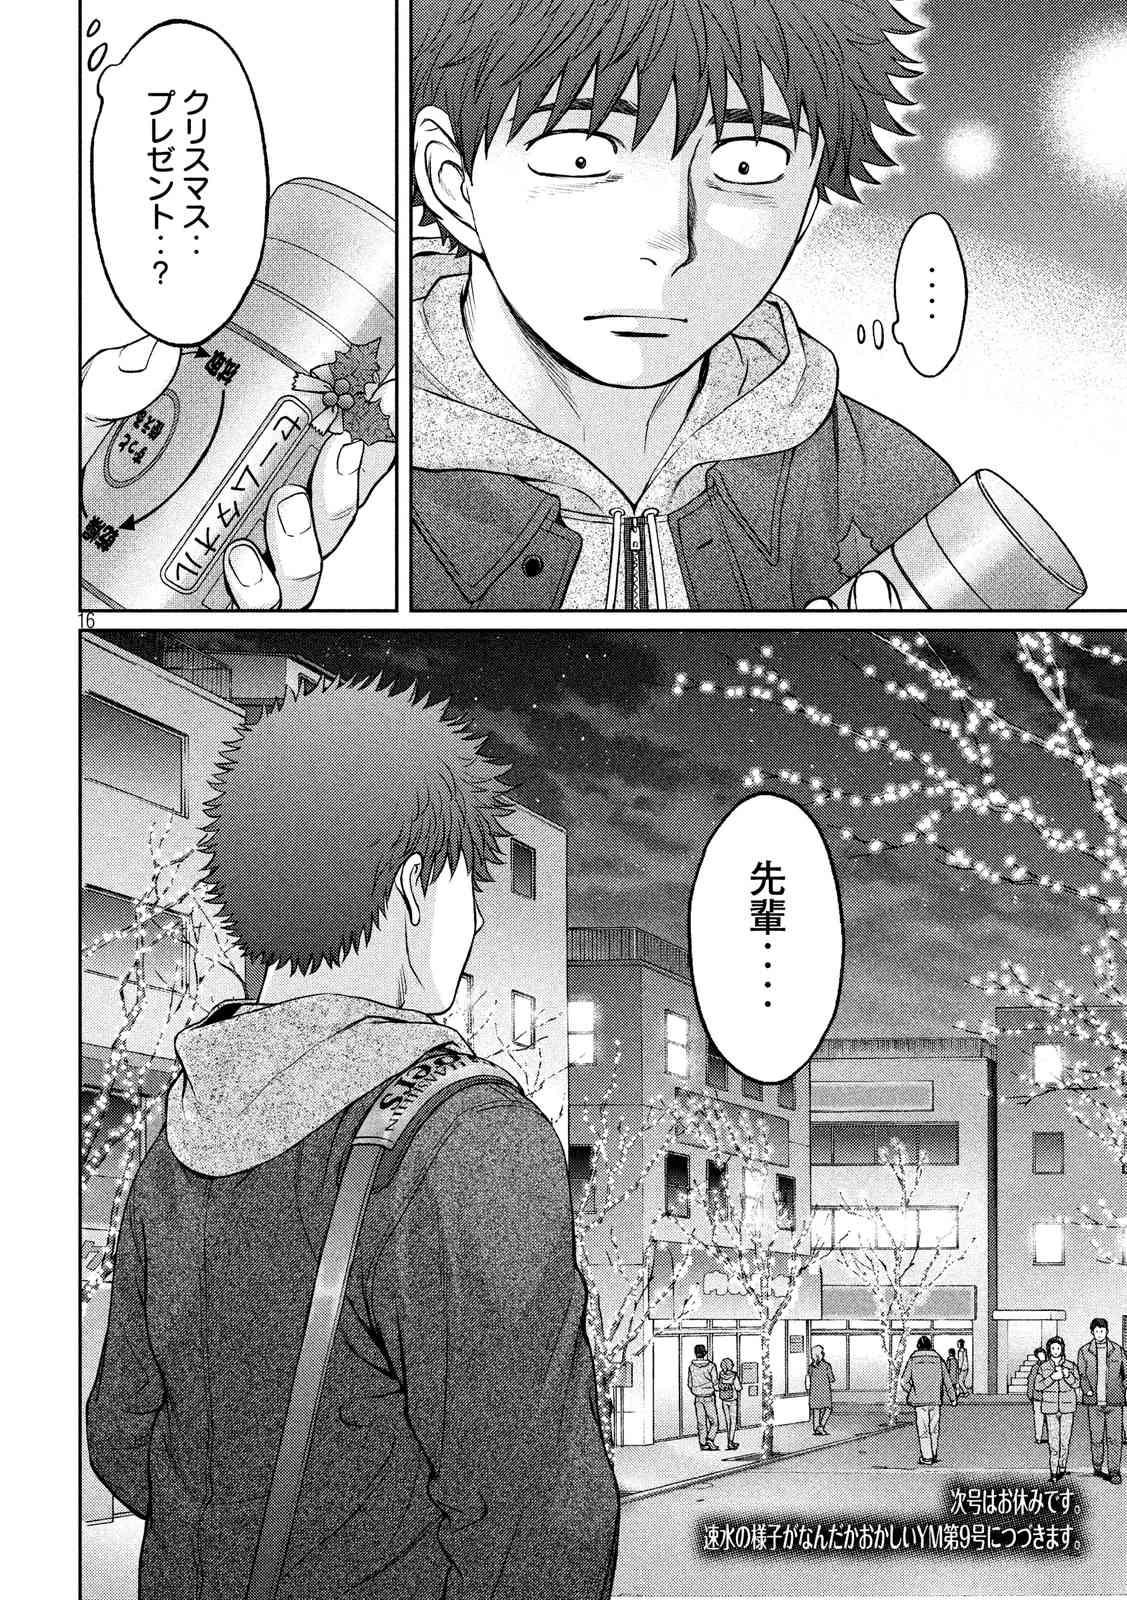 Hantsu x Trash - Chapter 131 - Page 16